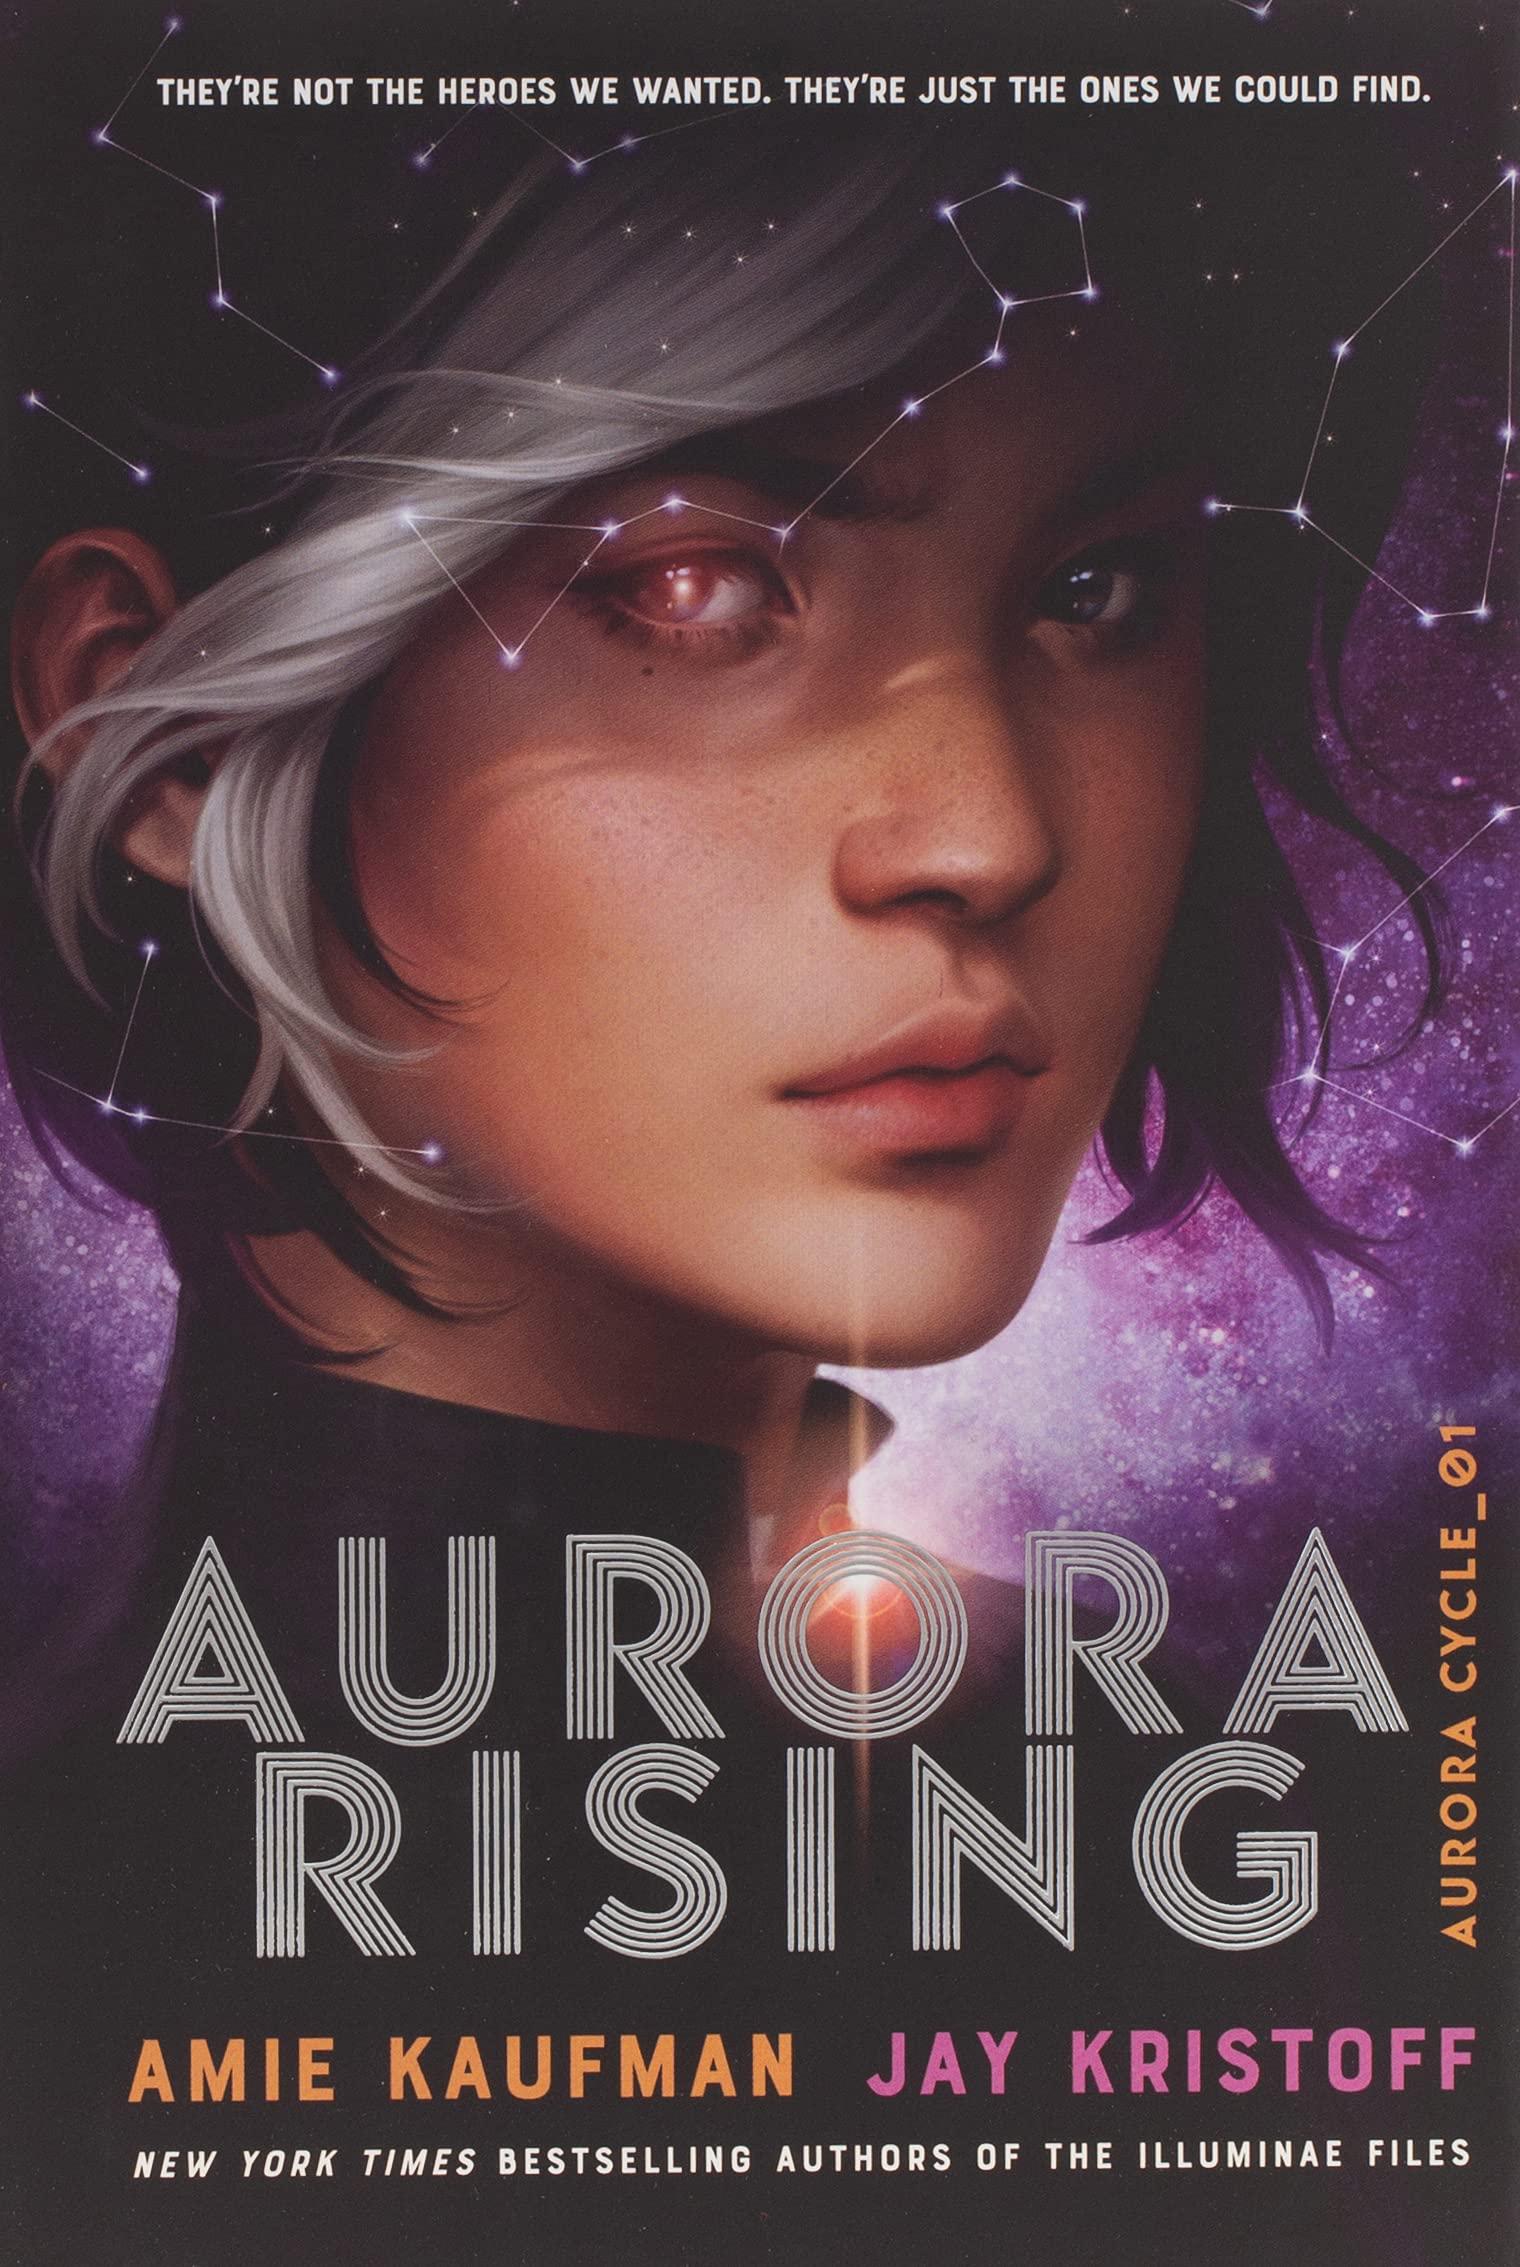 Amazon.com: Aurora Rising (The Aurora Cycle): 9781524720964: Kaufman, Amie,  Kristoff, Jay: Books